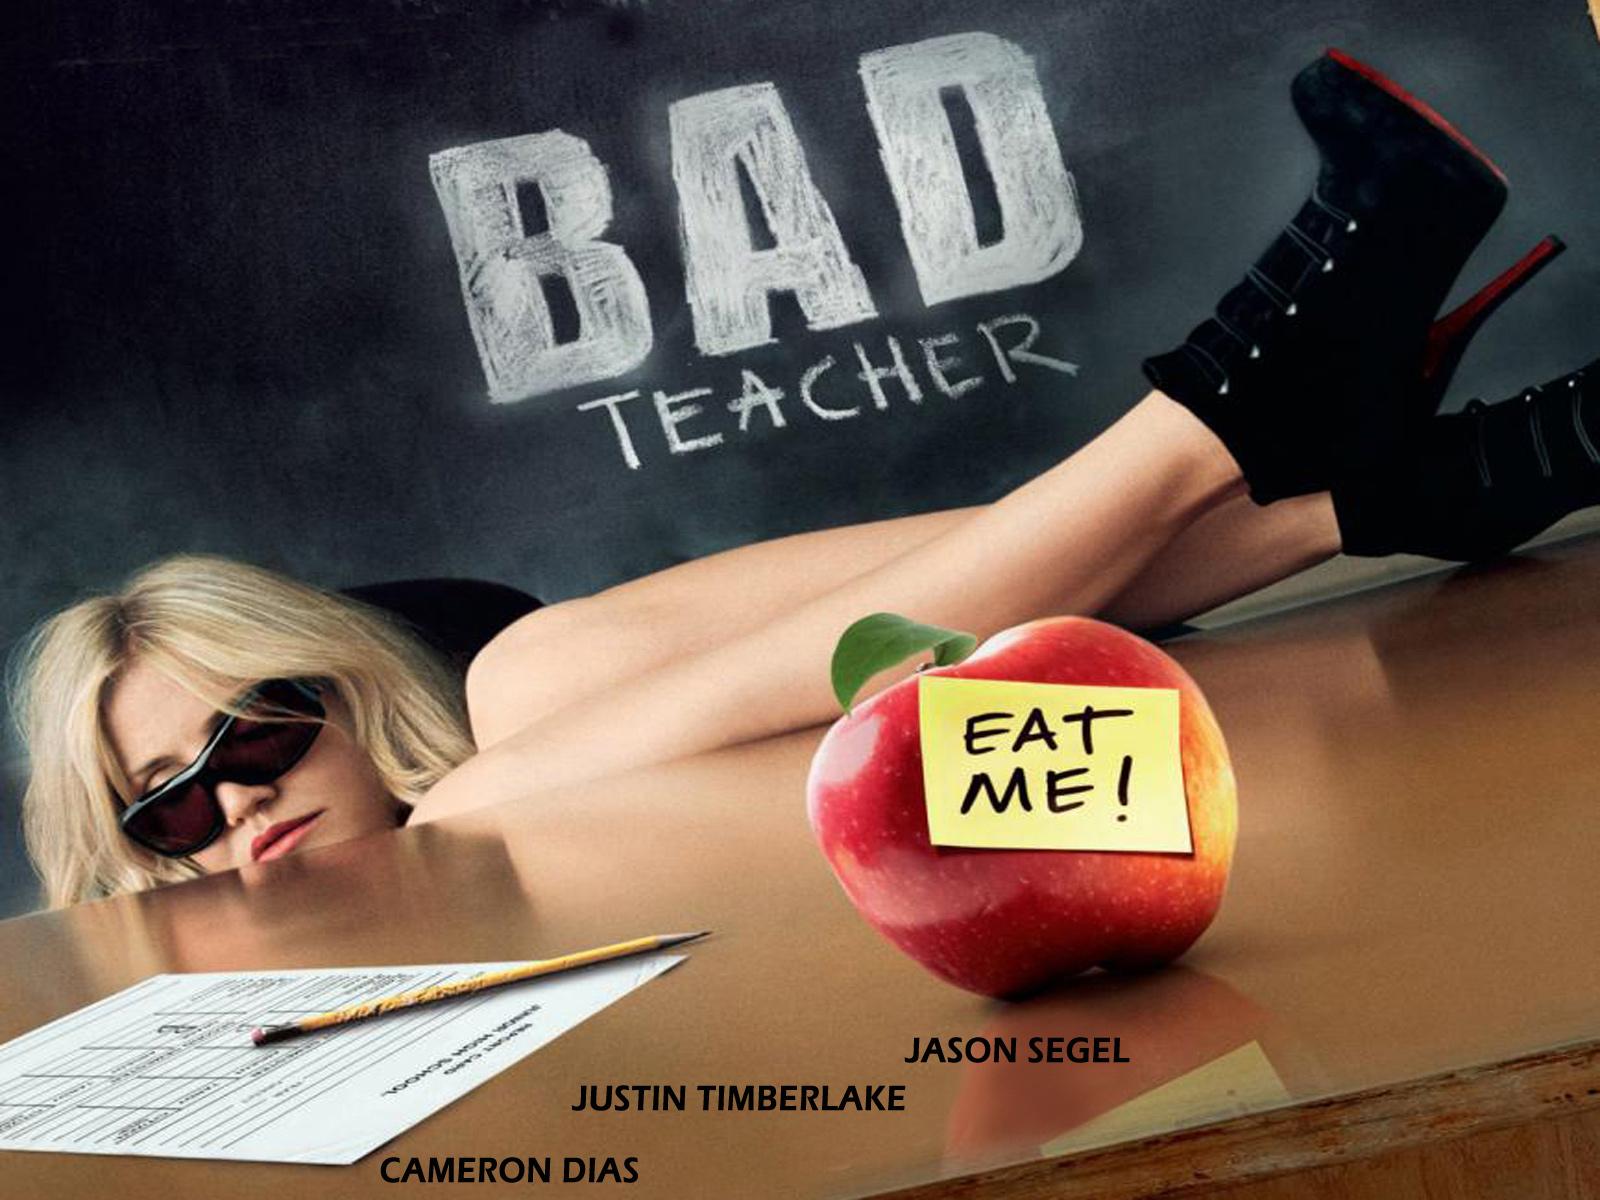 Bad-Teacher-Wallpaper-Poster-Backgrounds